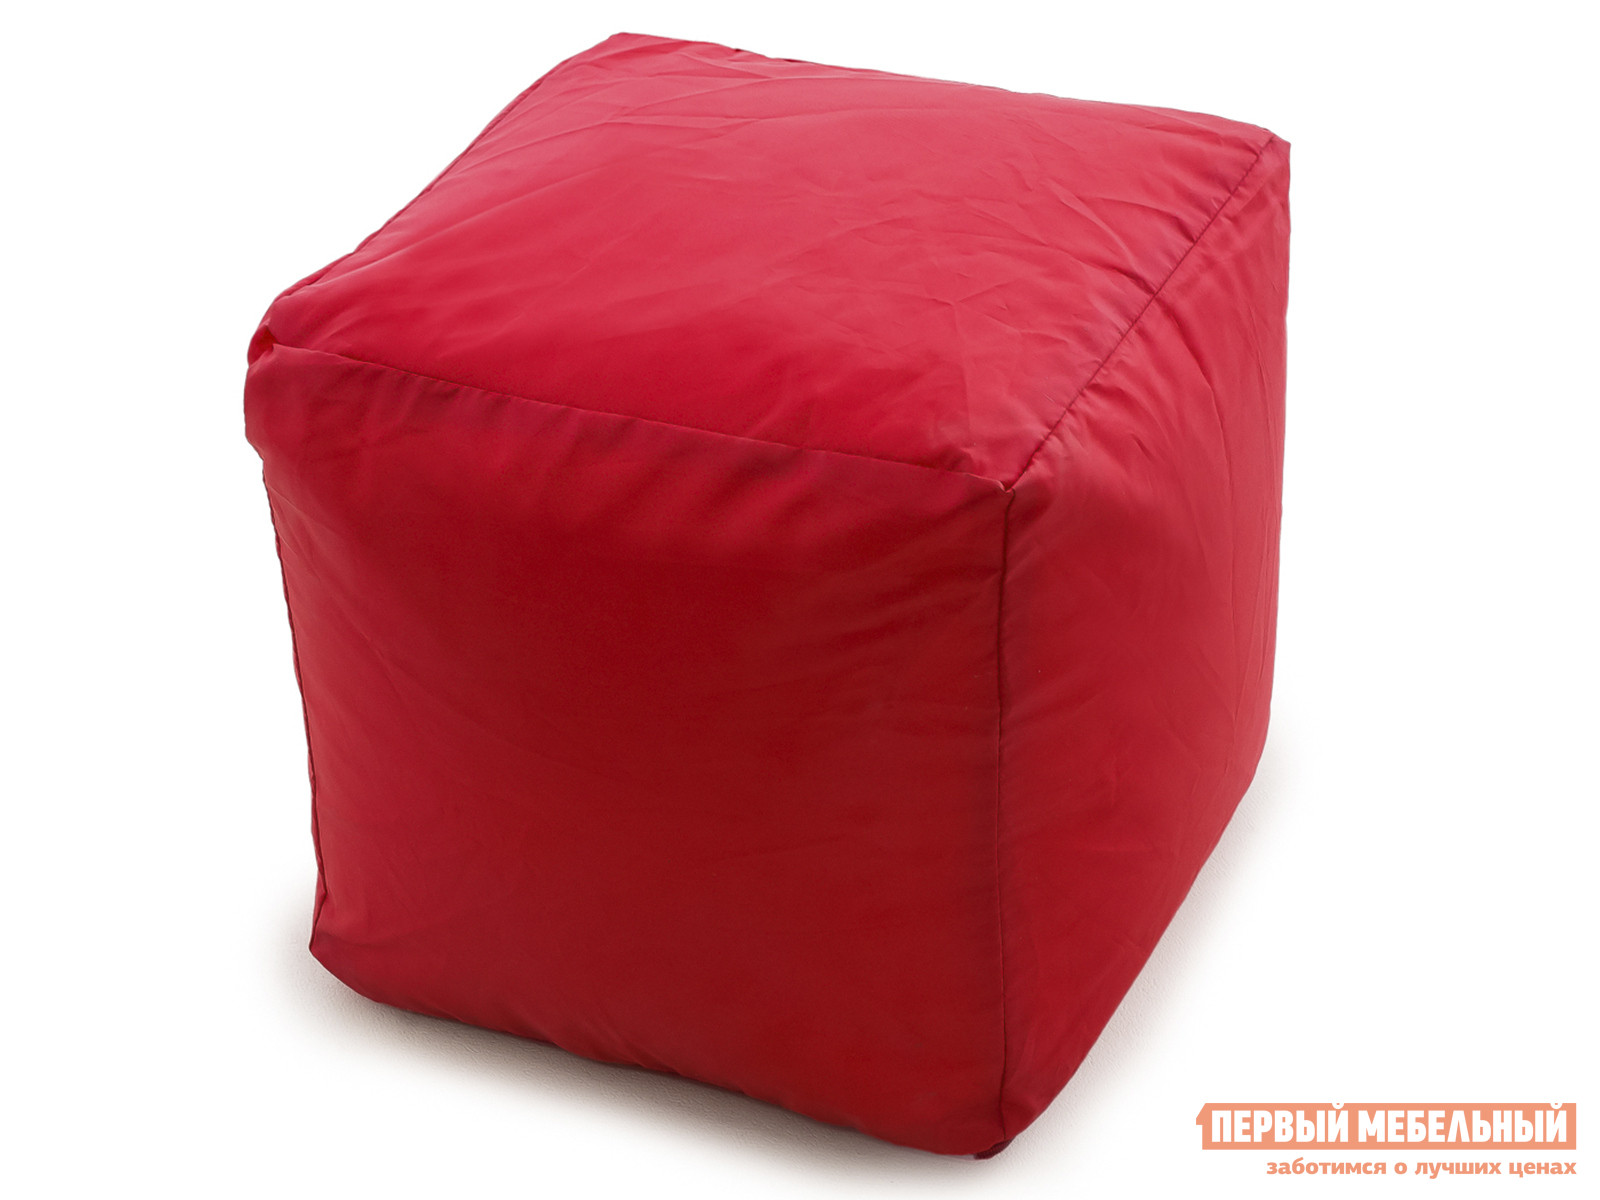 Пуфик  Кубик Красный — Кубик Красный